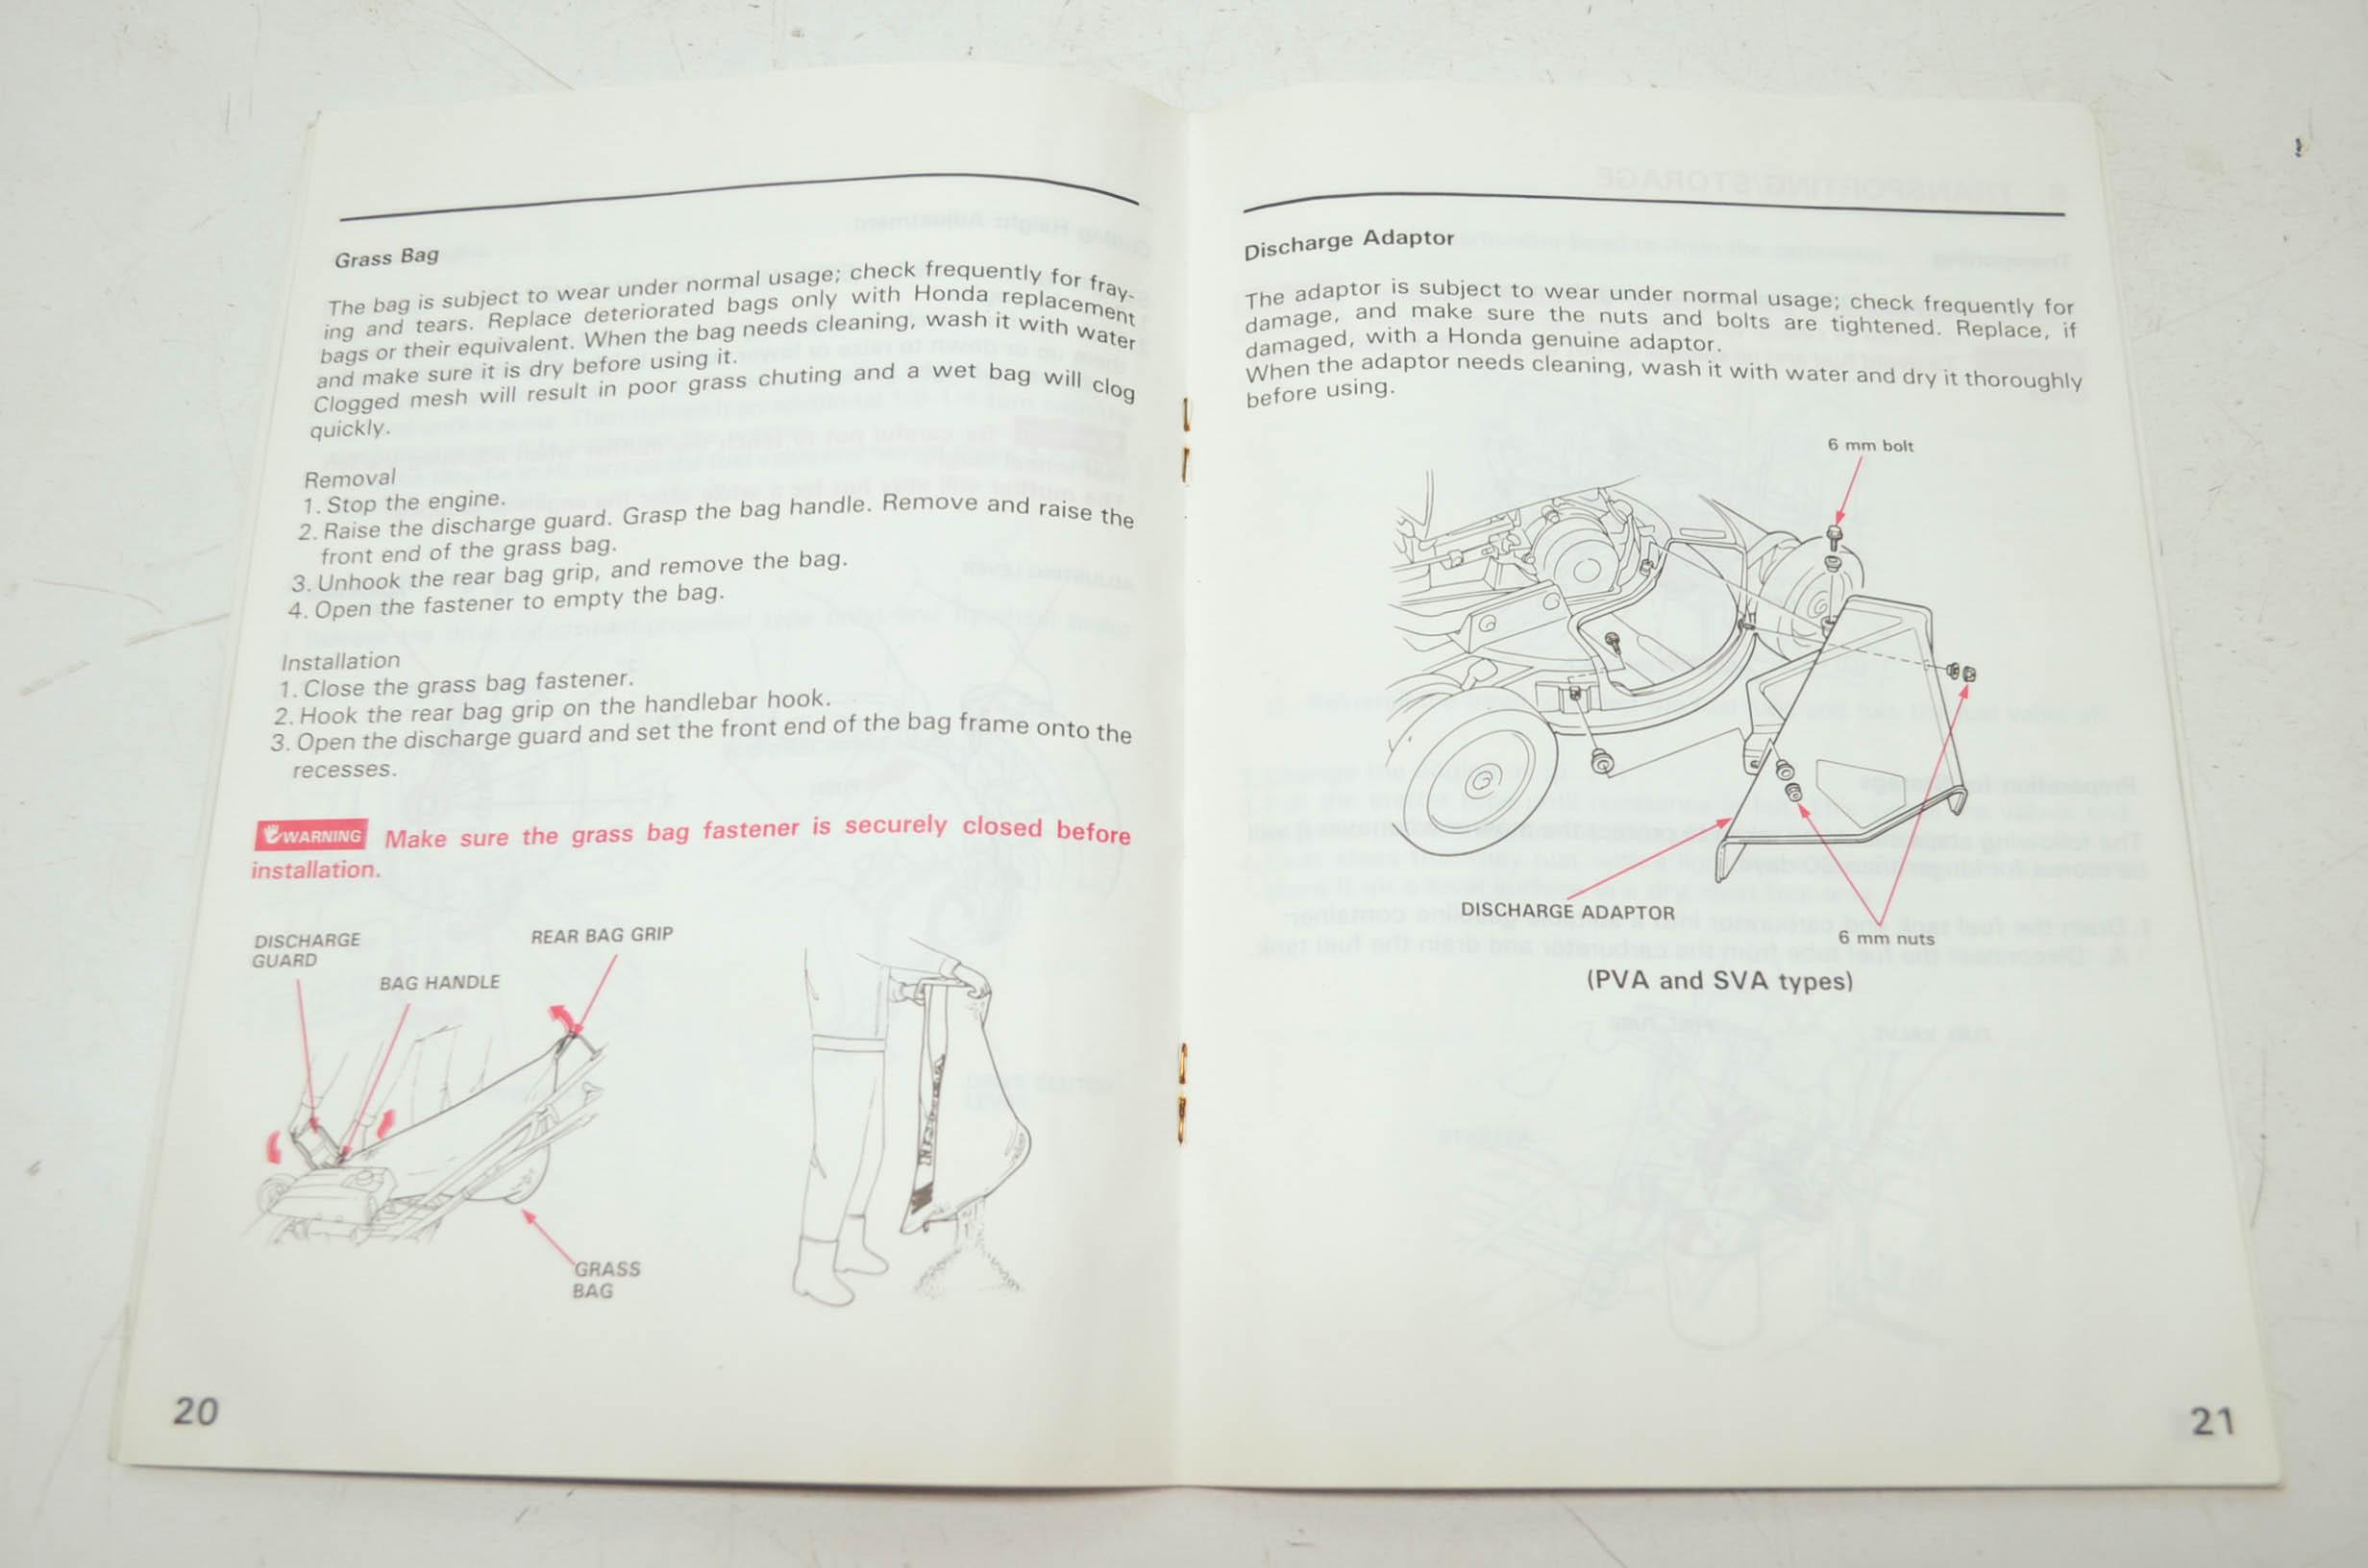 Honda Harmony Hrm215 Carburetor Diagram Guide And Troubleshooting Mower User Manual Hrb215 Hrb216 Hrb217 Lawn Wheels